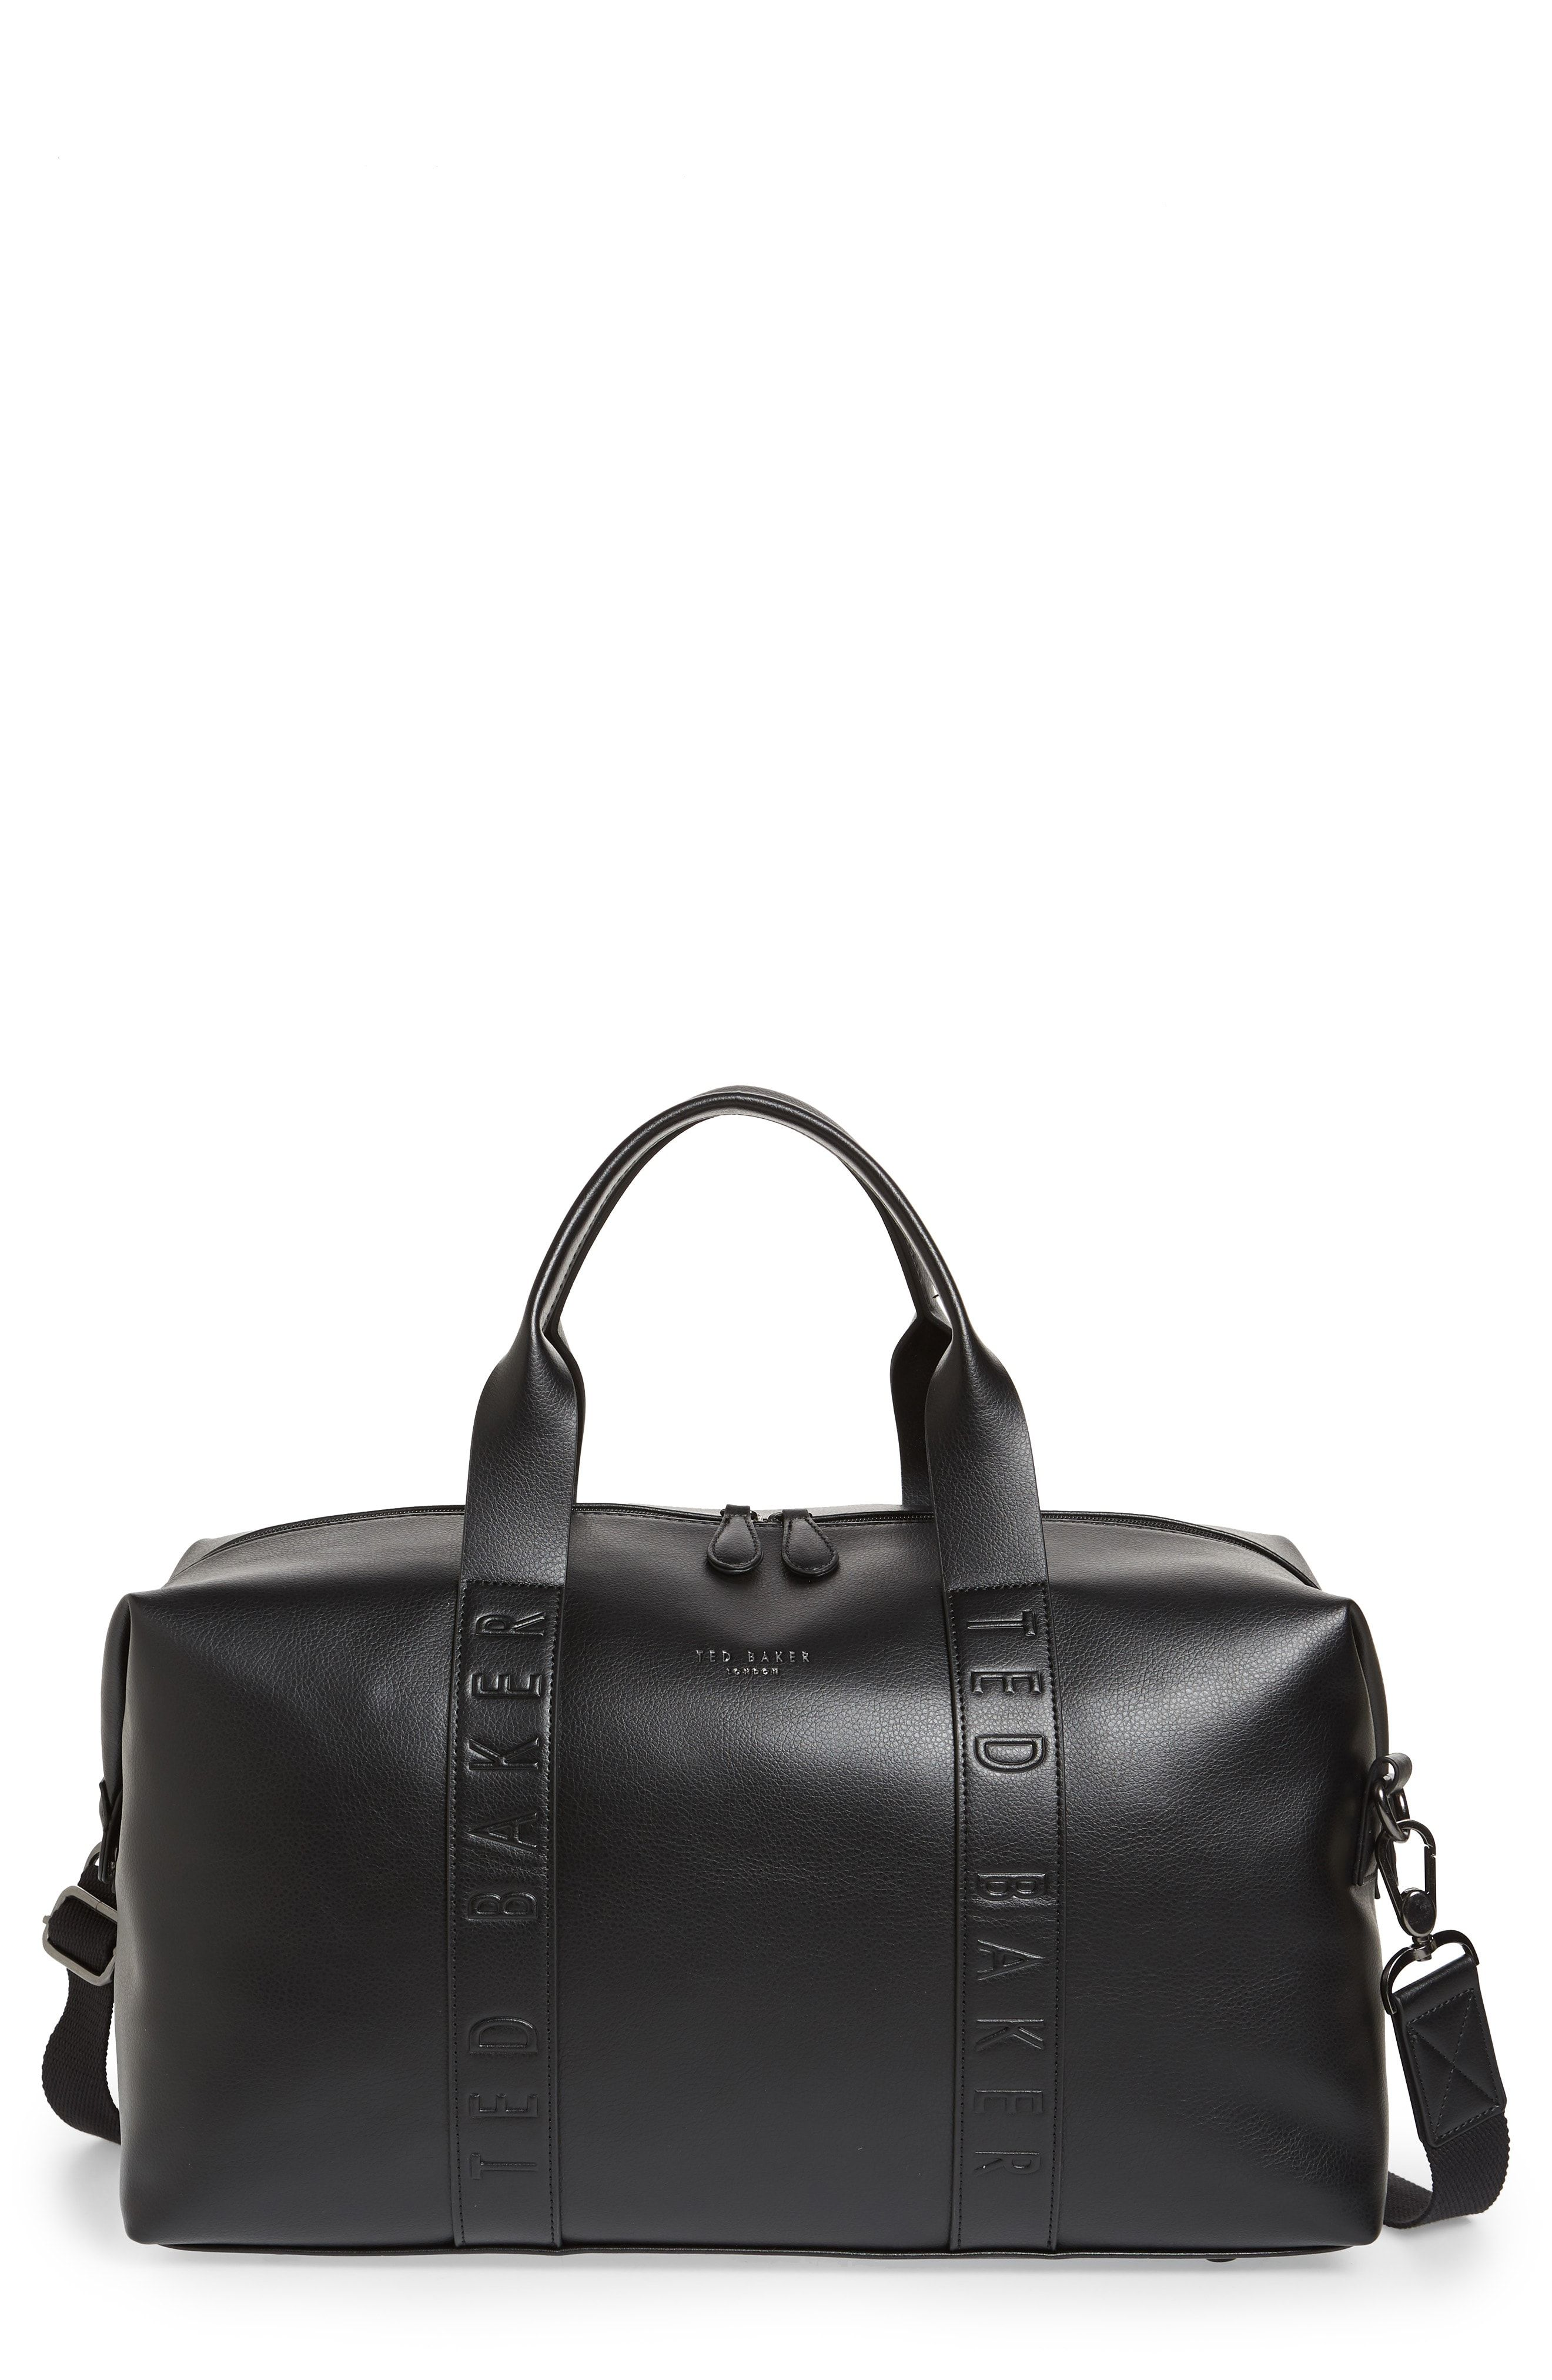 81c82a0ee6294 TED BAKER DEBOSSED FAUX LEATHER DUFFEL BAG - BLACK.  tedbaker  bags  leather